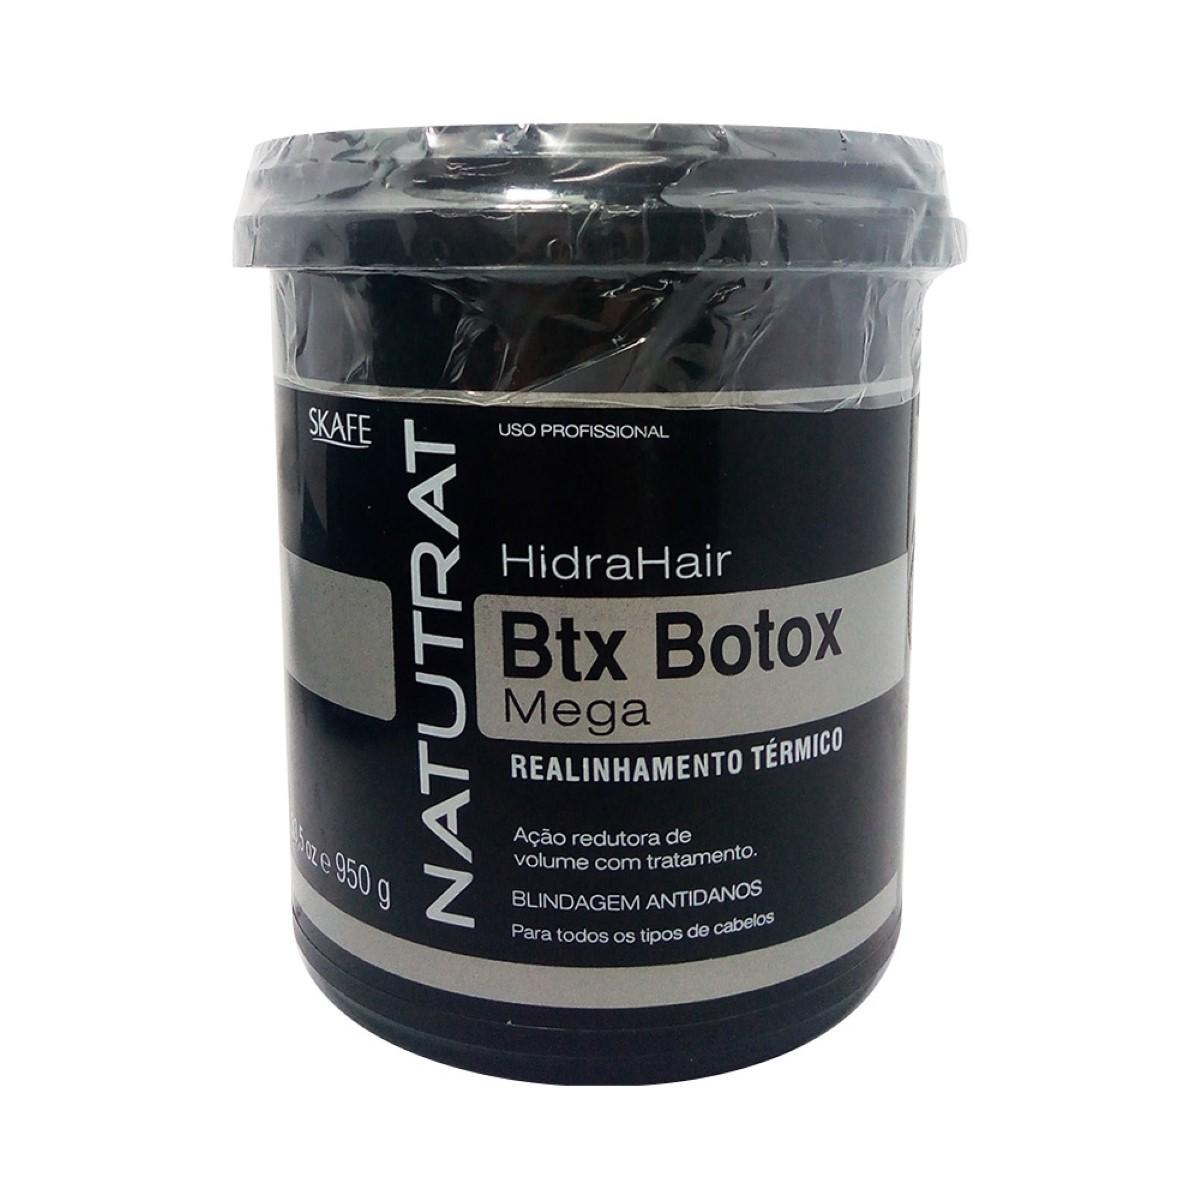 Botox Natutrat HidraHair Mega 950g - Skafe